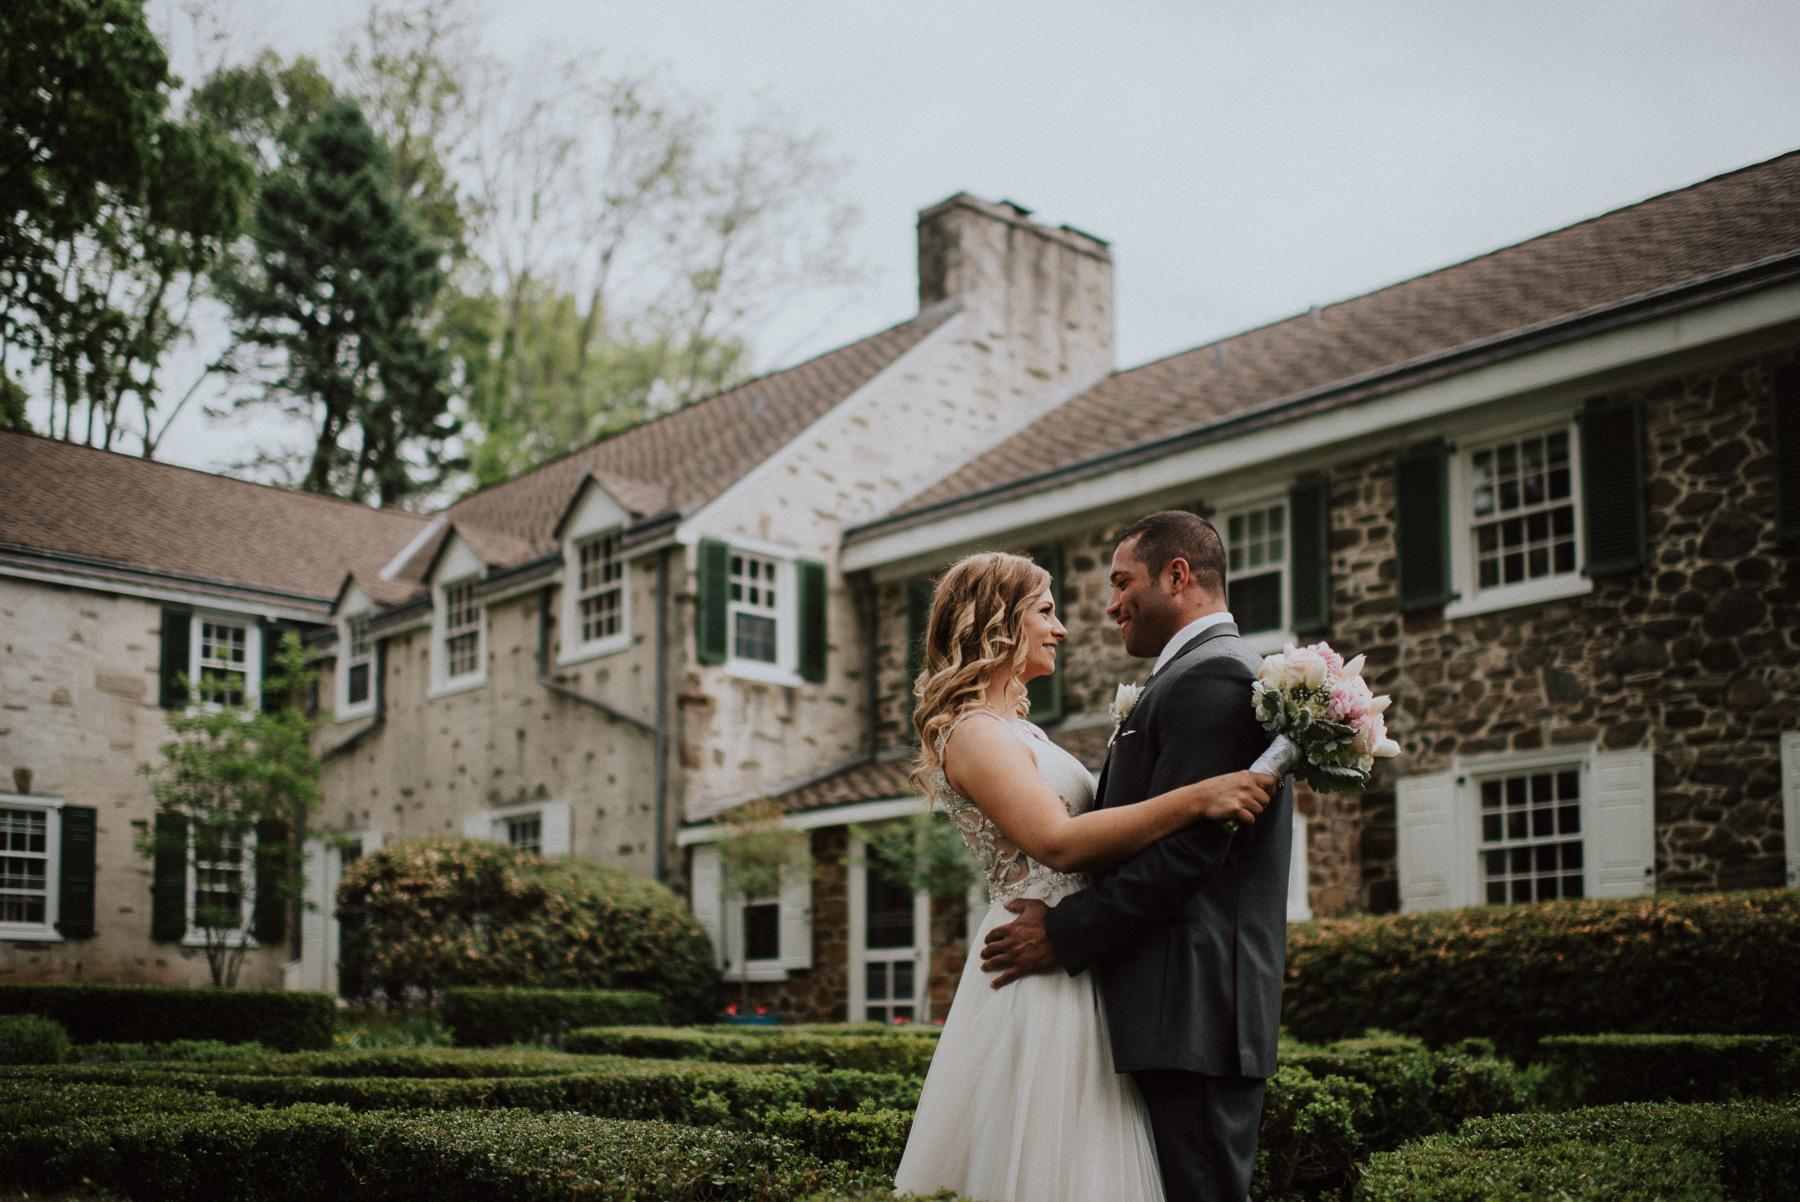 appleford-estate-wedding-photography-49.jpg